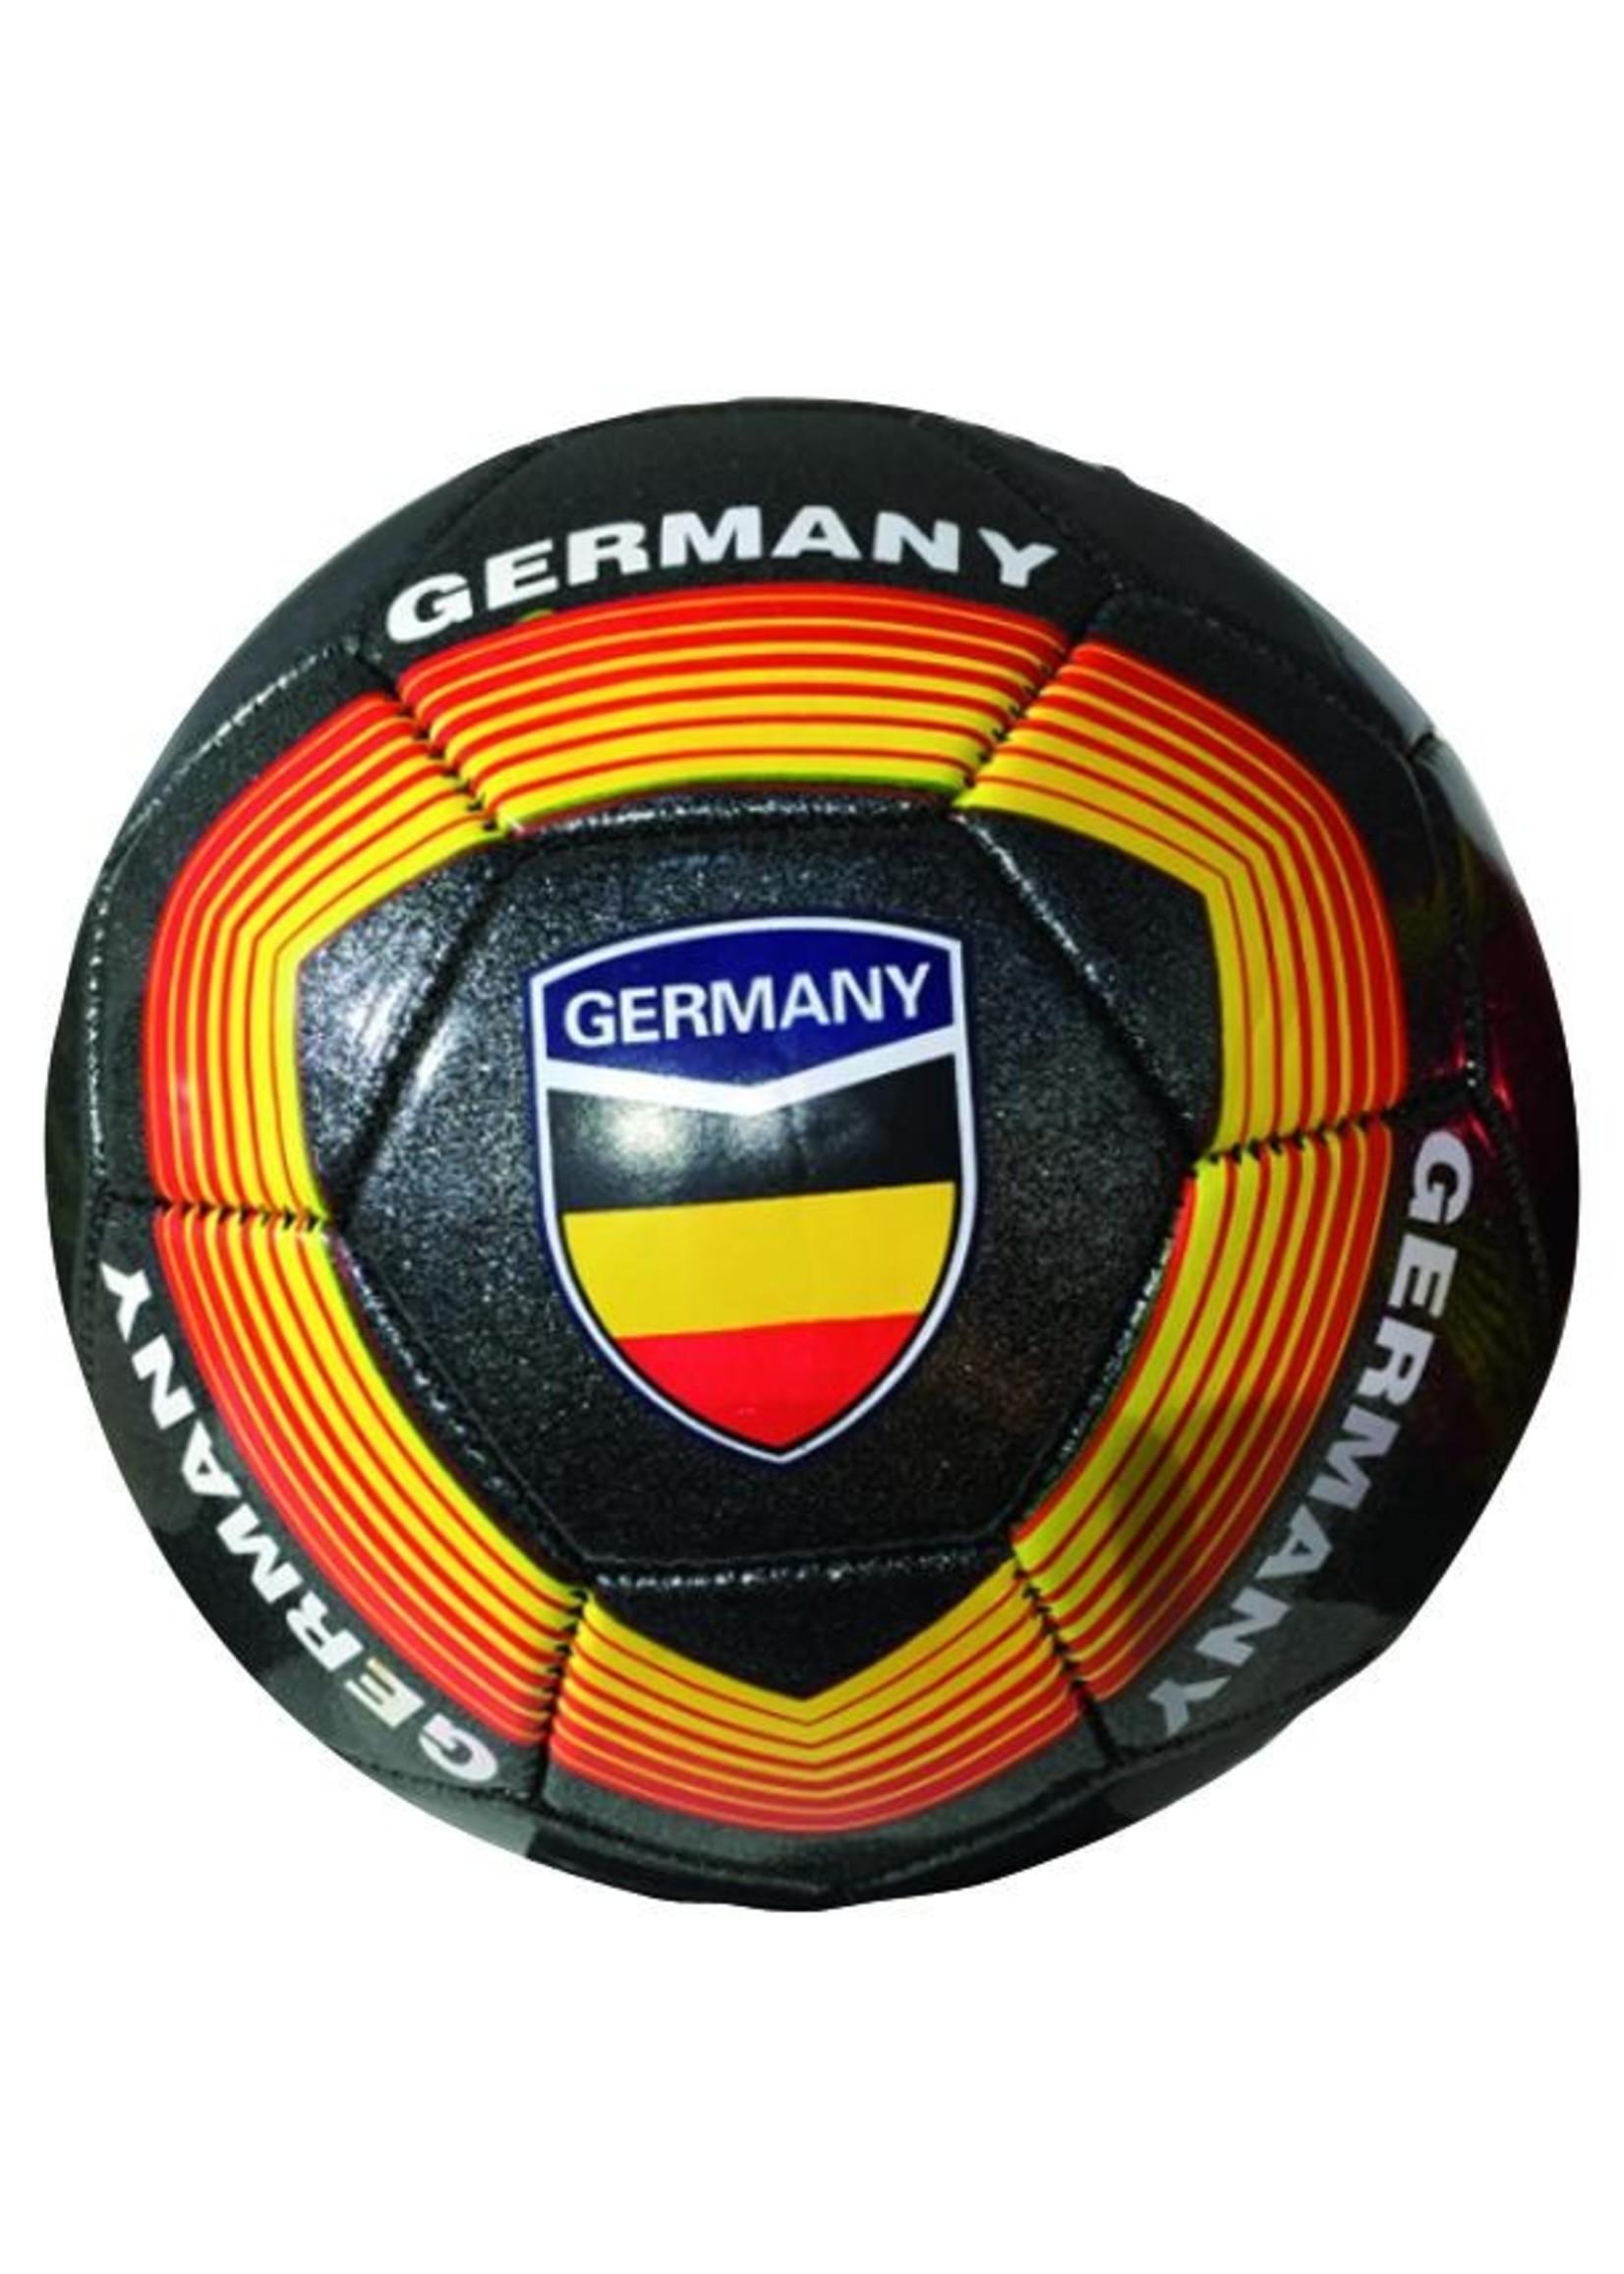 SOCCER BALL GERMANY